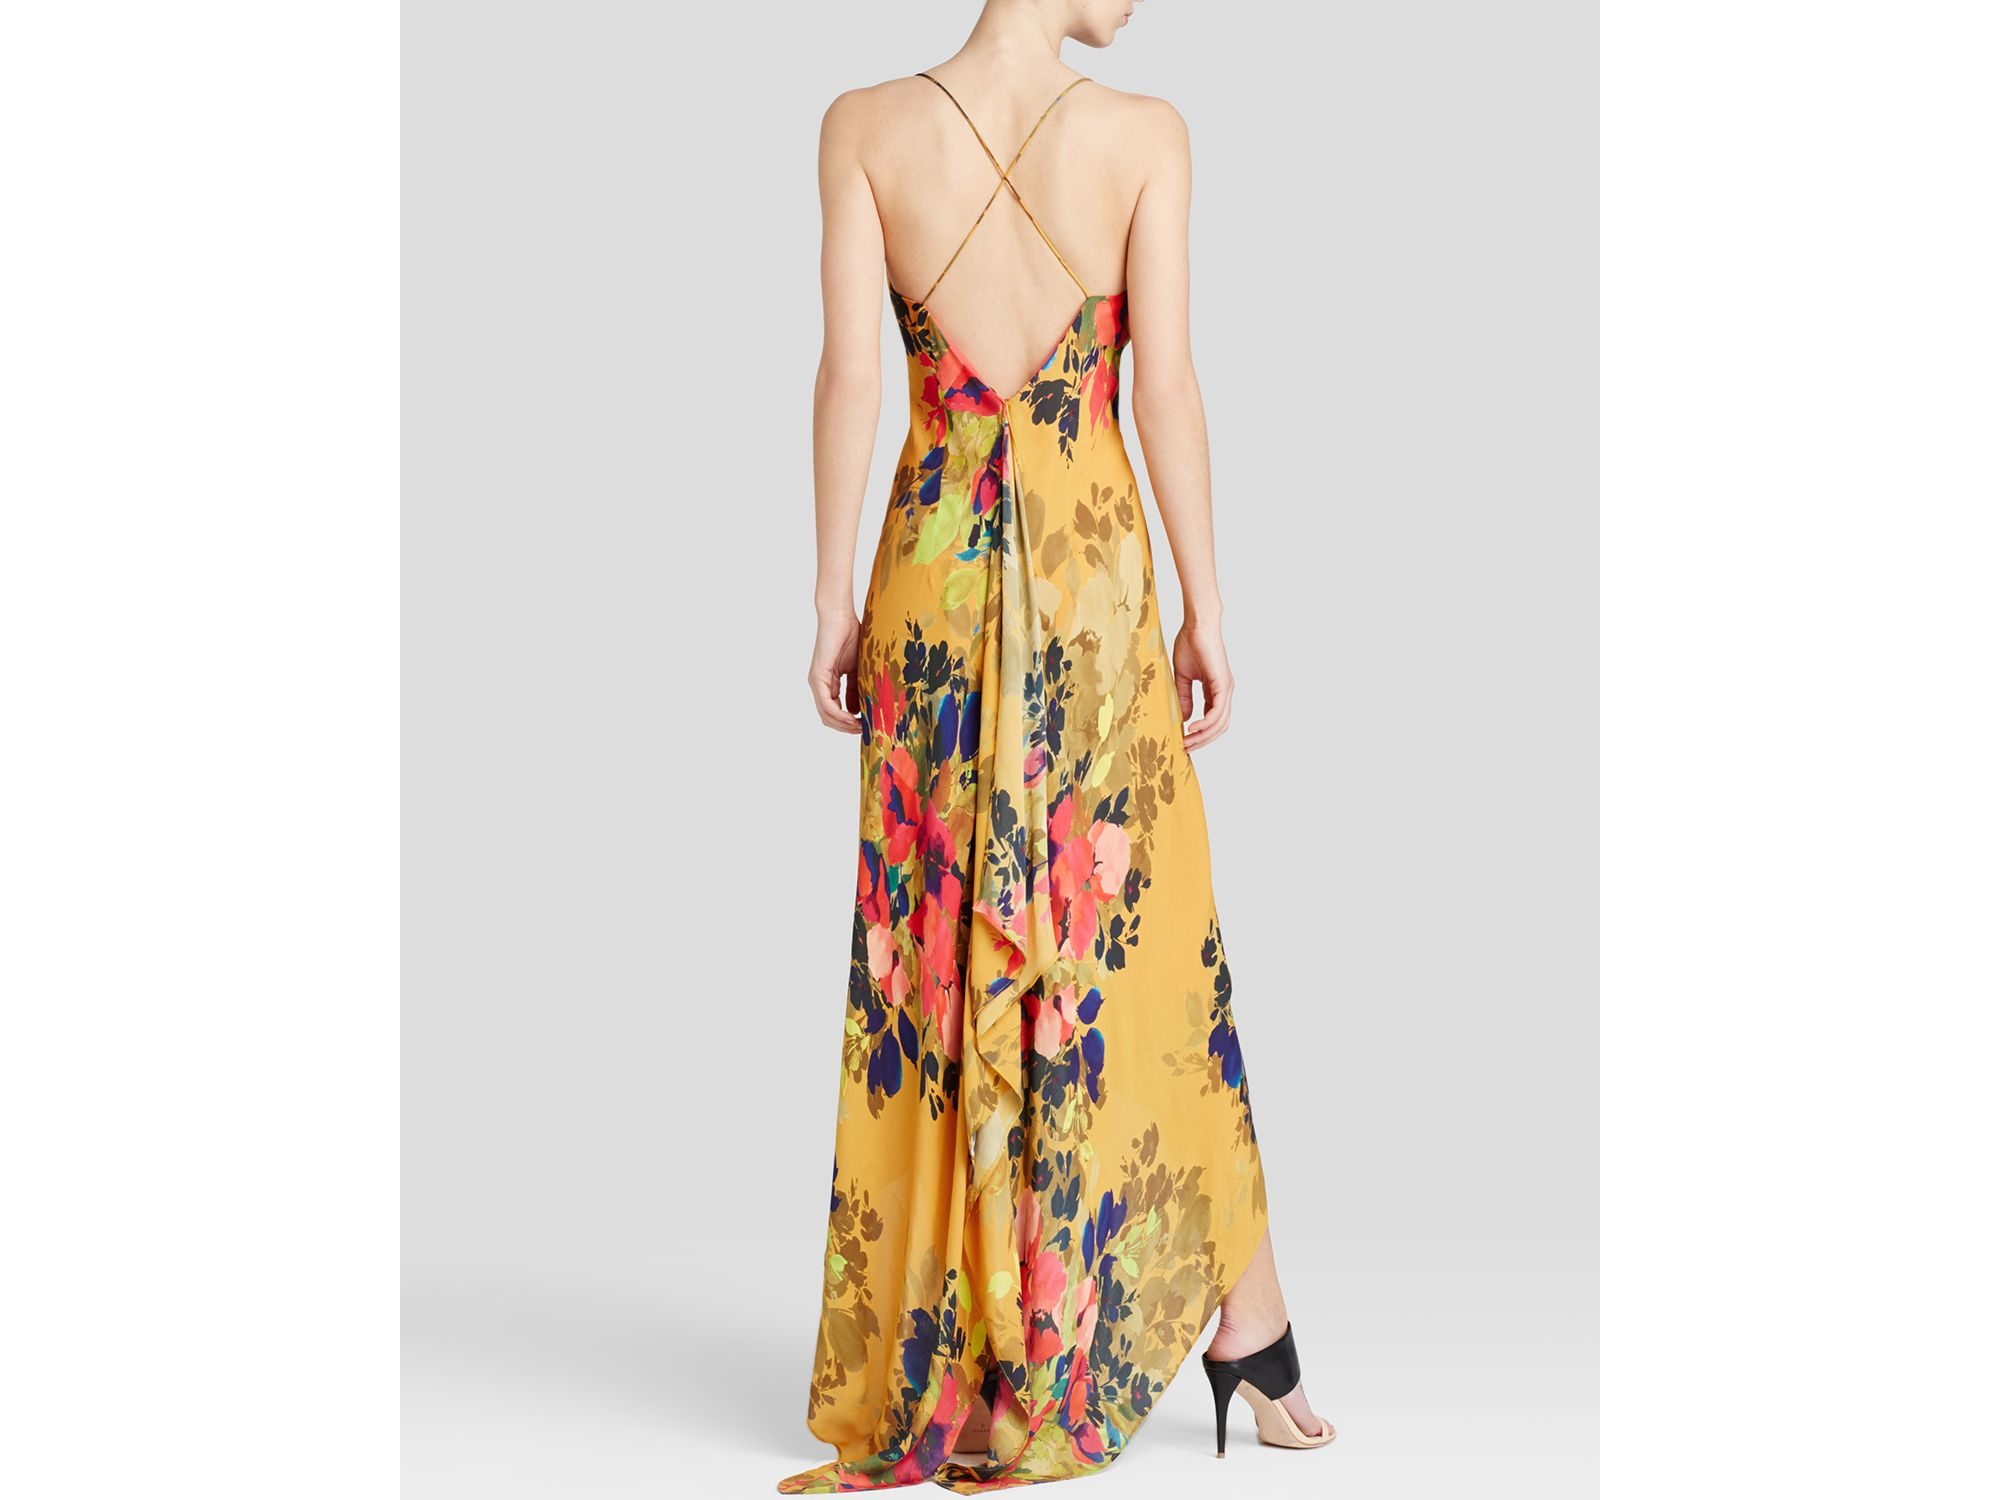 Nicole miller Maxi Dress - Angelina Satin Printed High/low Hem   Lyst